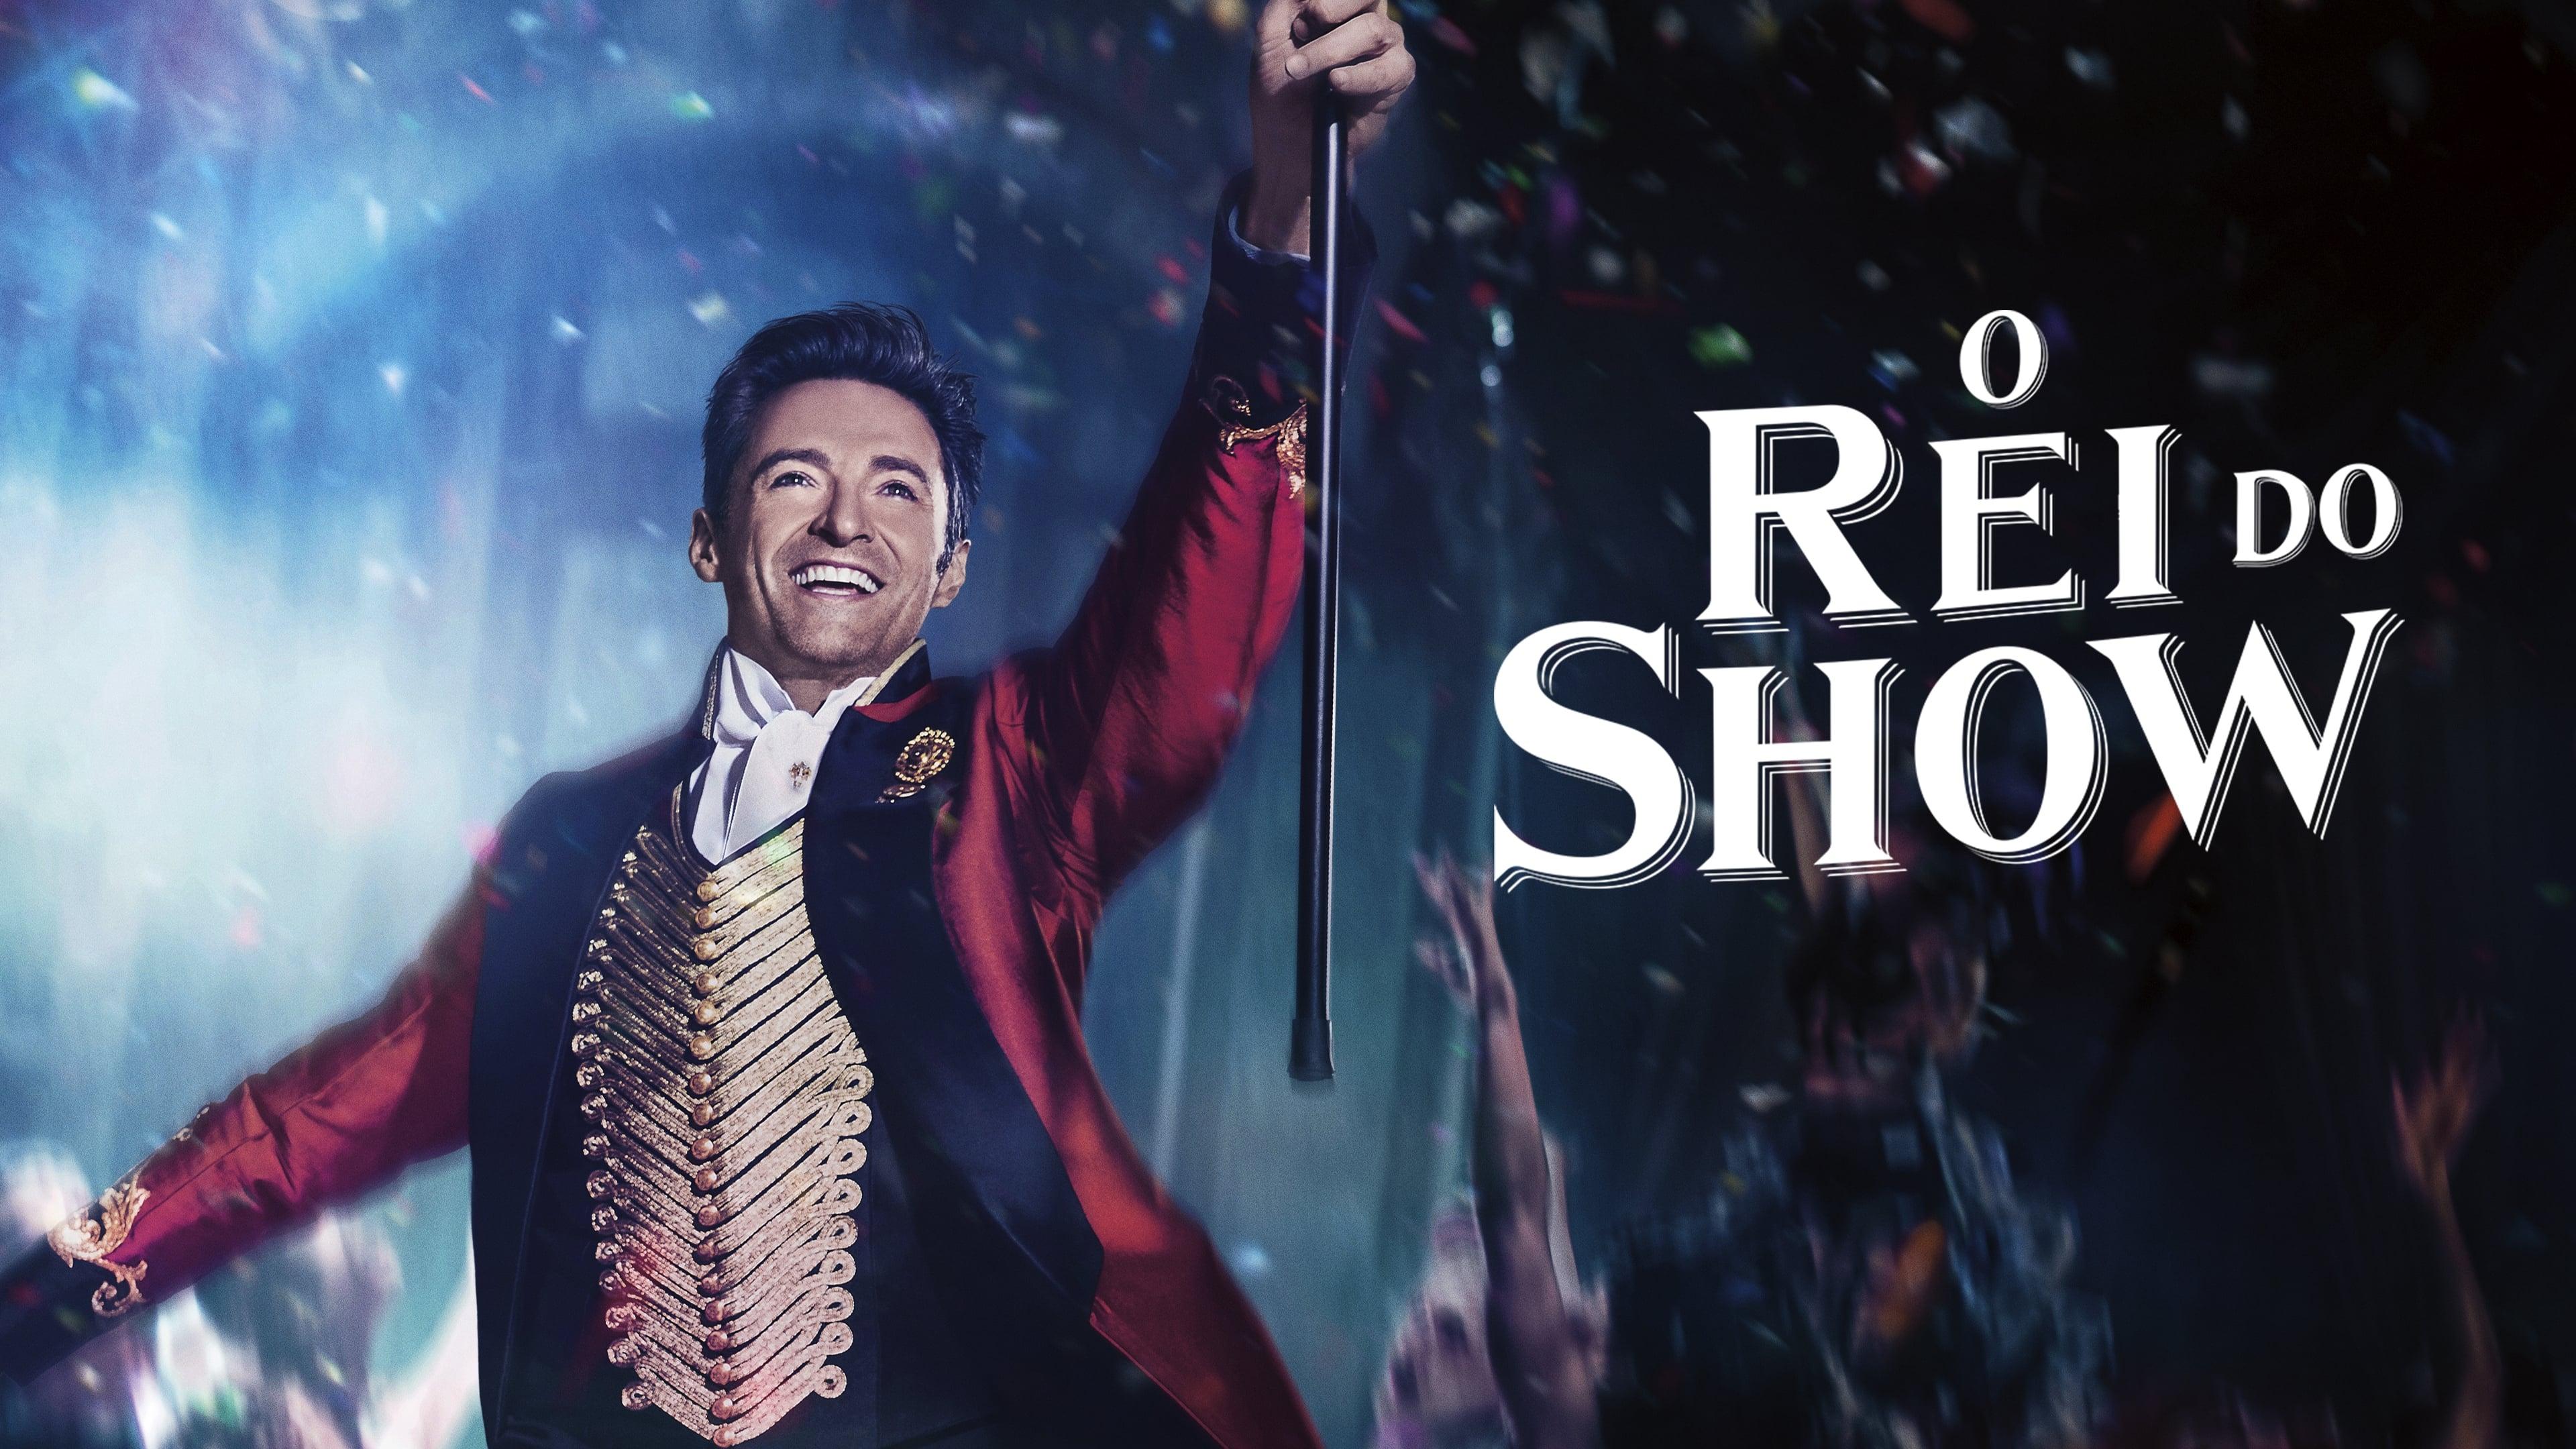 Watch The Greatest Showman Online